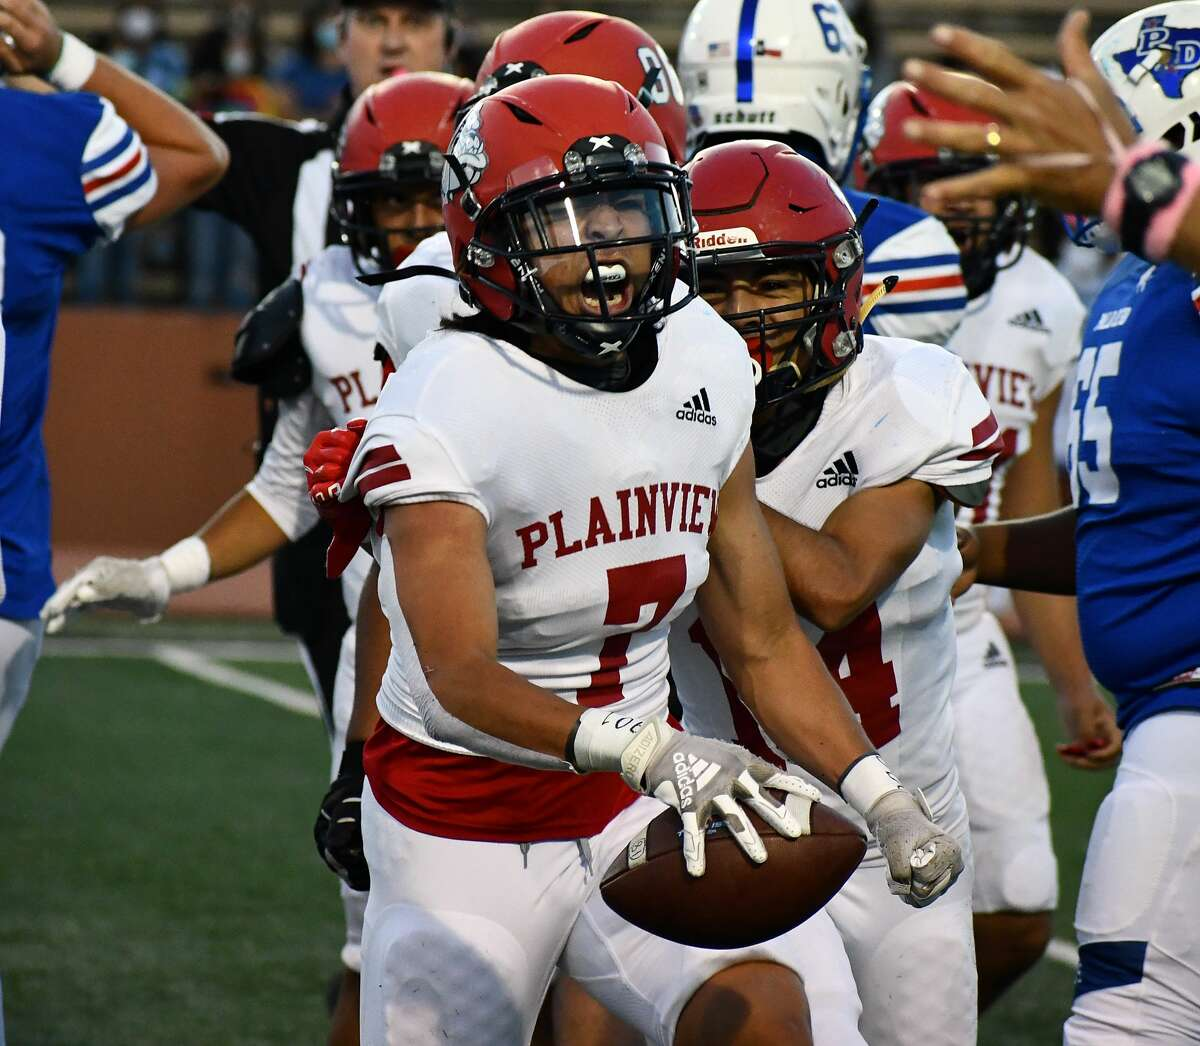 The Plainview football team defeated Amarillo Palo Duro 28-14 on Thursday, Oct. 1, 2020 in Dick Bivins Stadium in Amarillo.